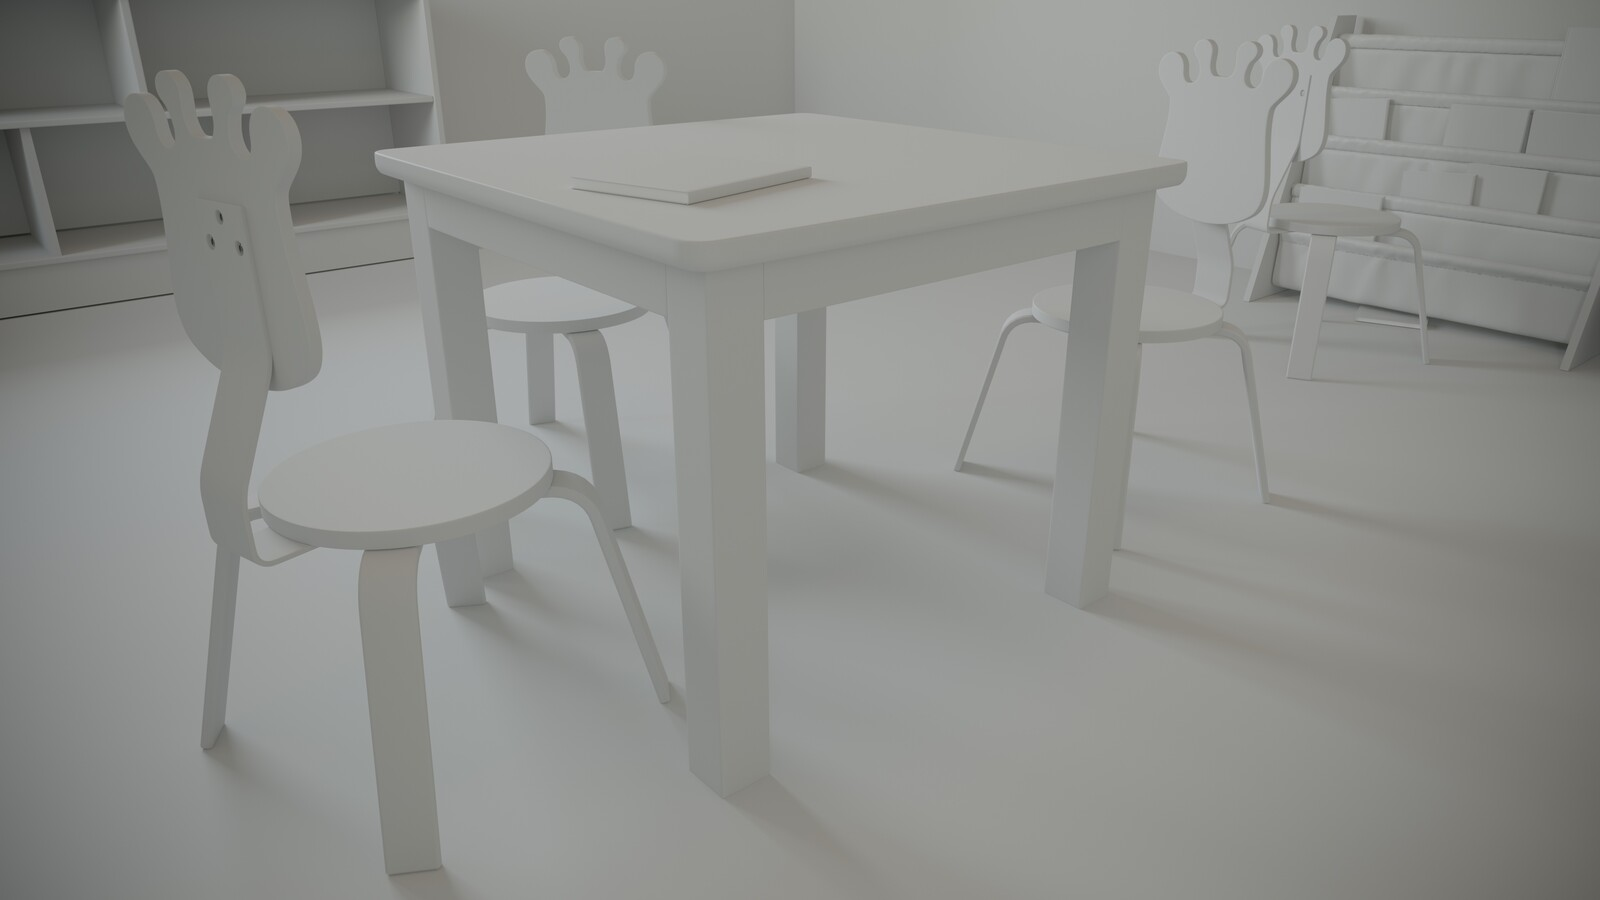 Virtual Reality Preschool Environment - WIP